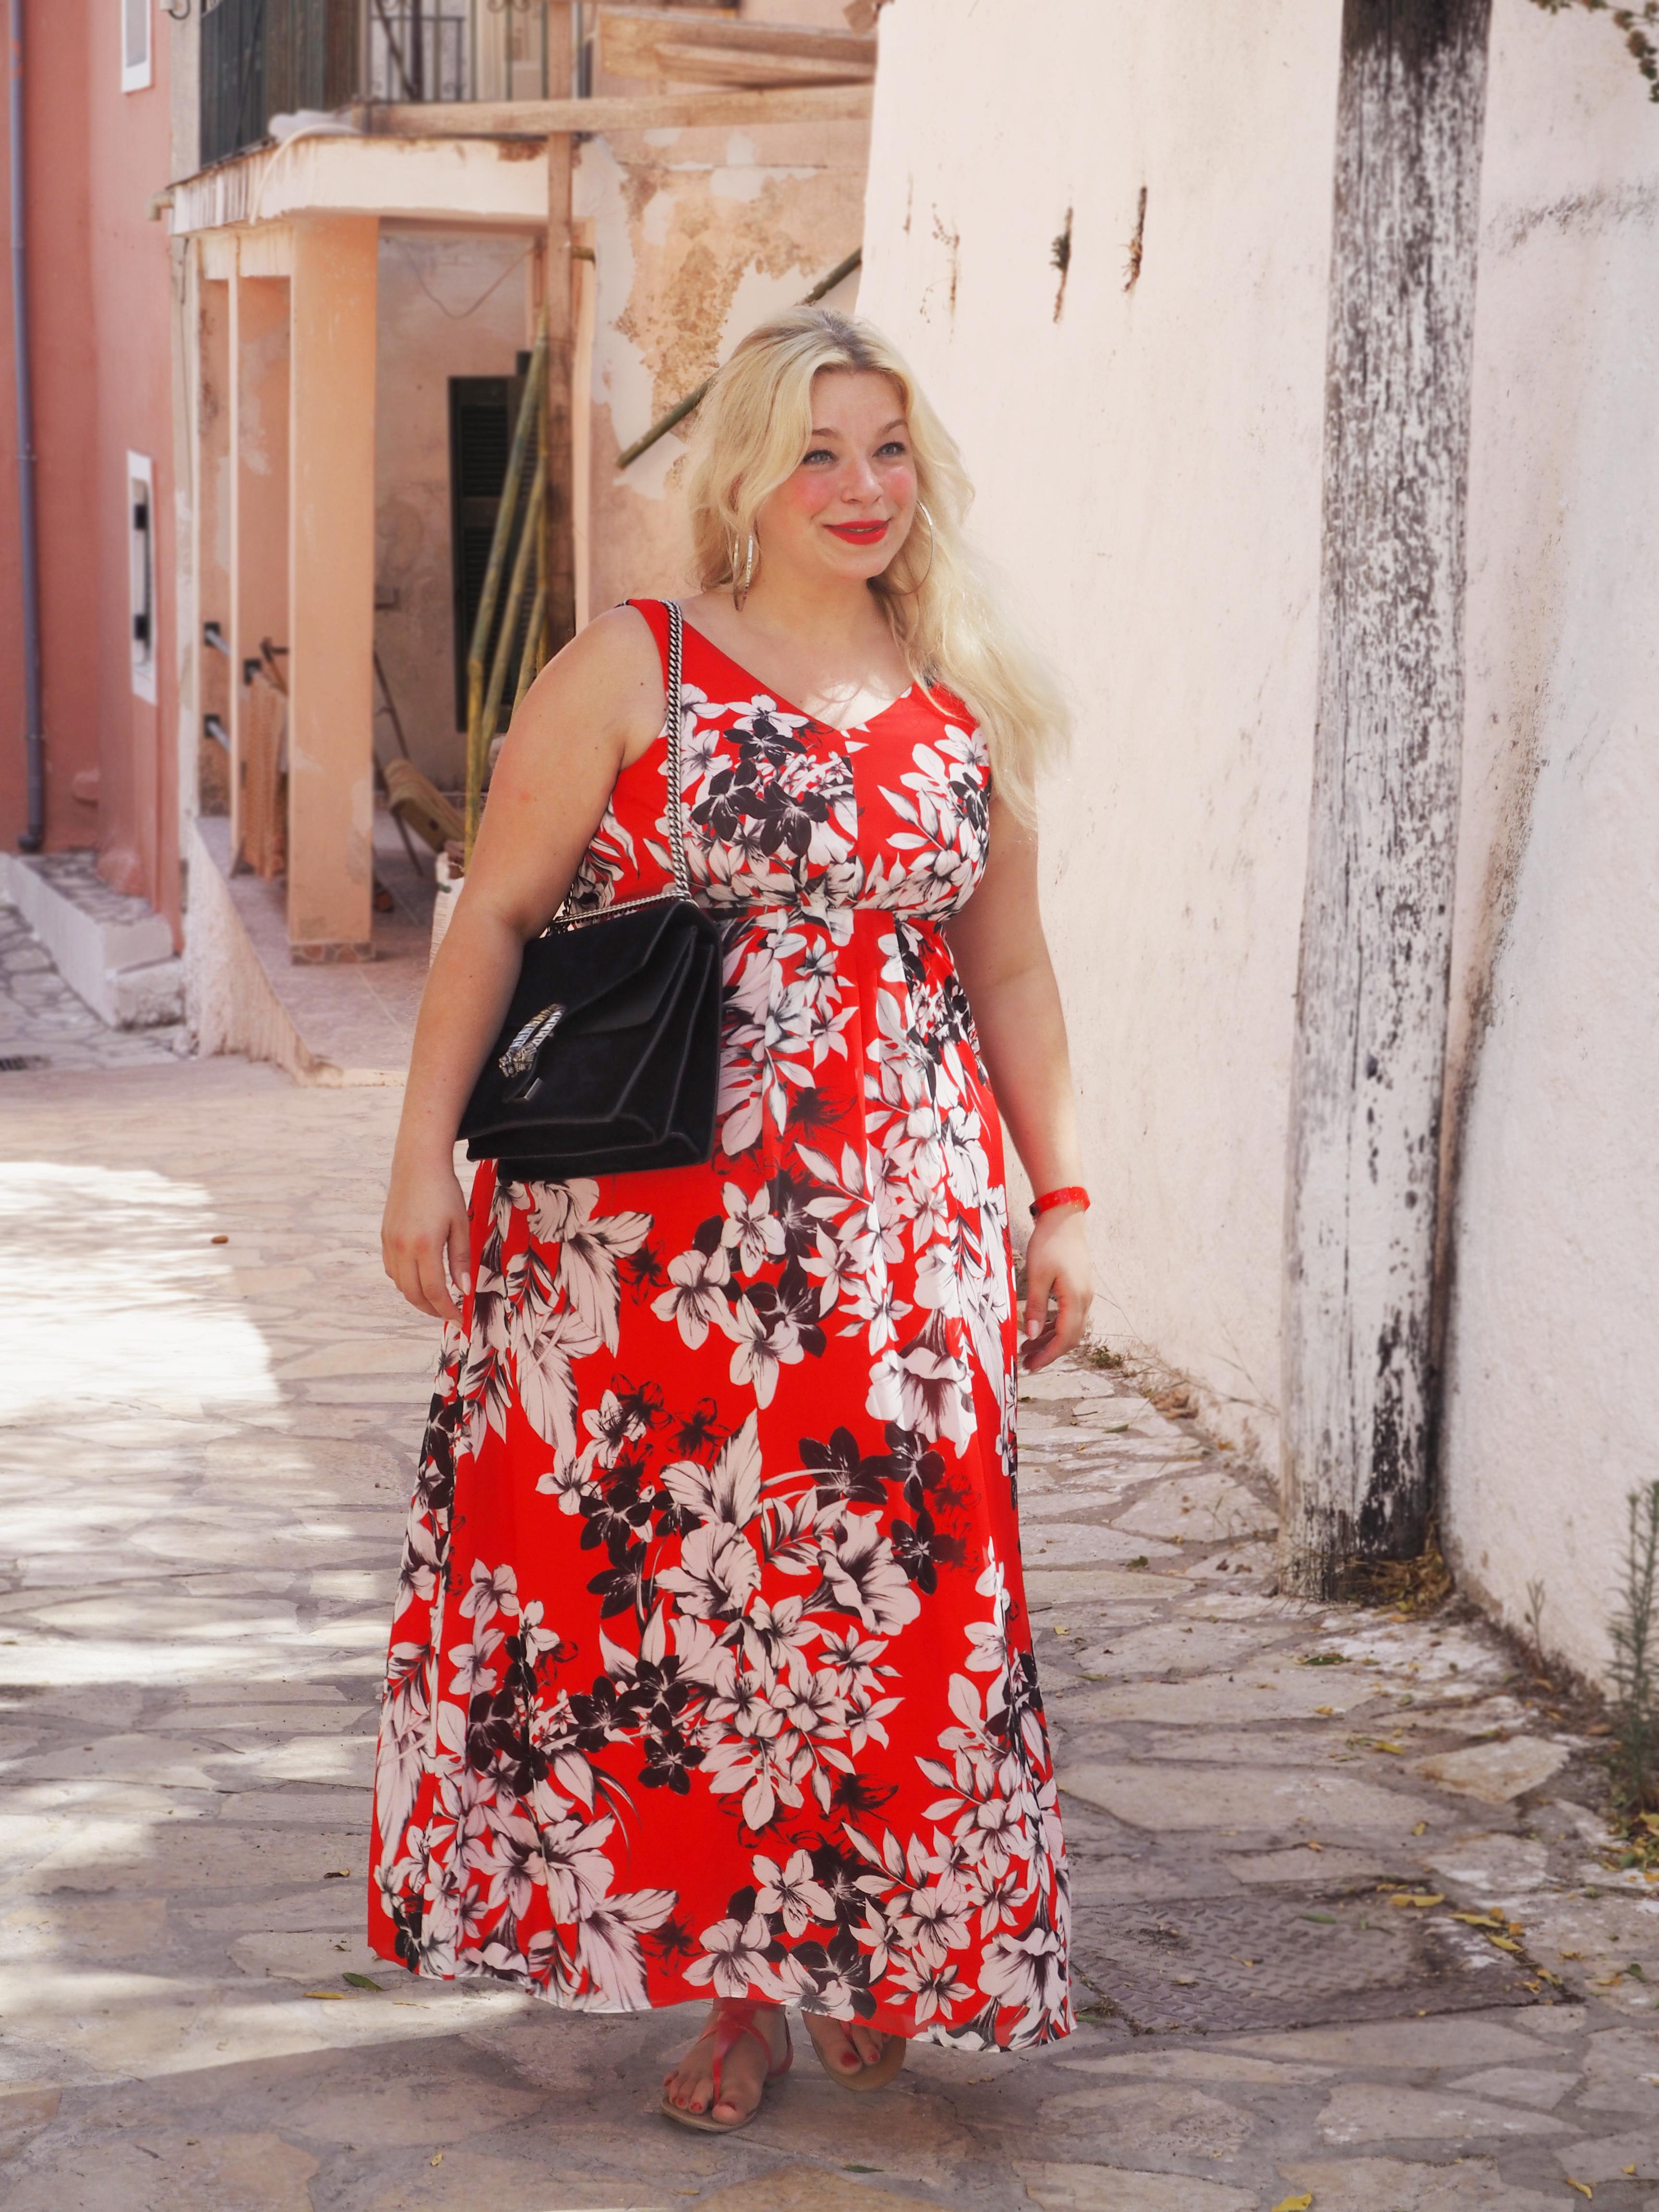 Caterina-pogorzelski-Megabambi-navabi-Plussizeblogger-Curvyfashion